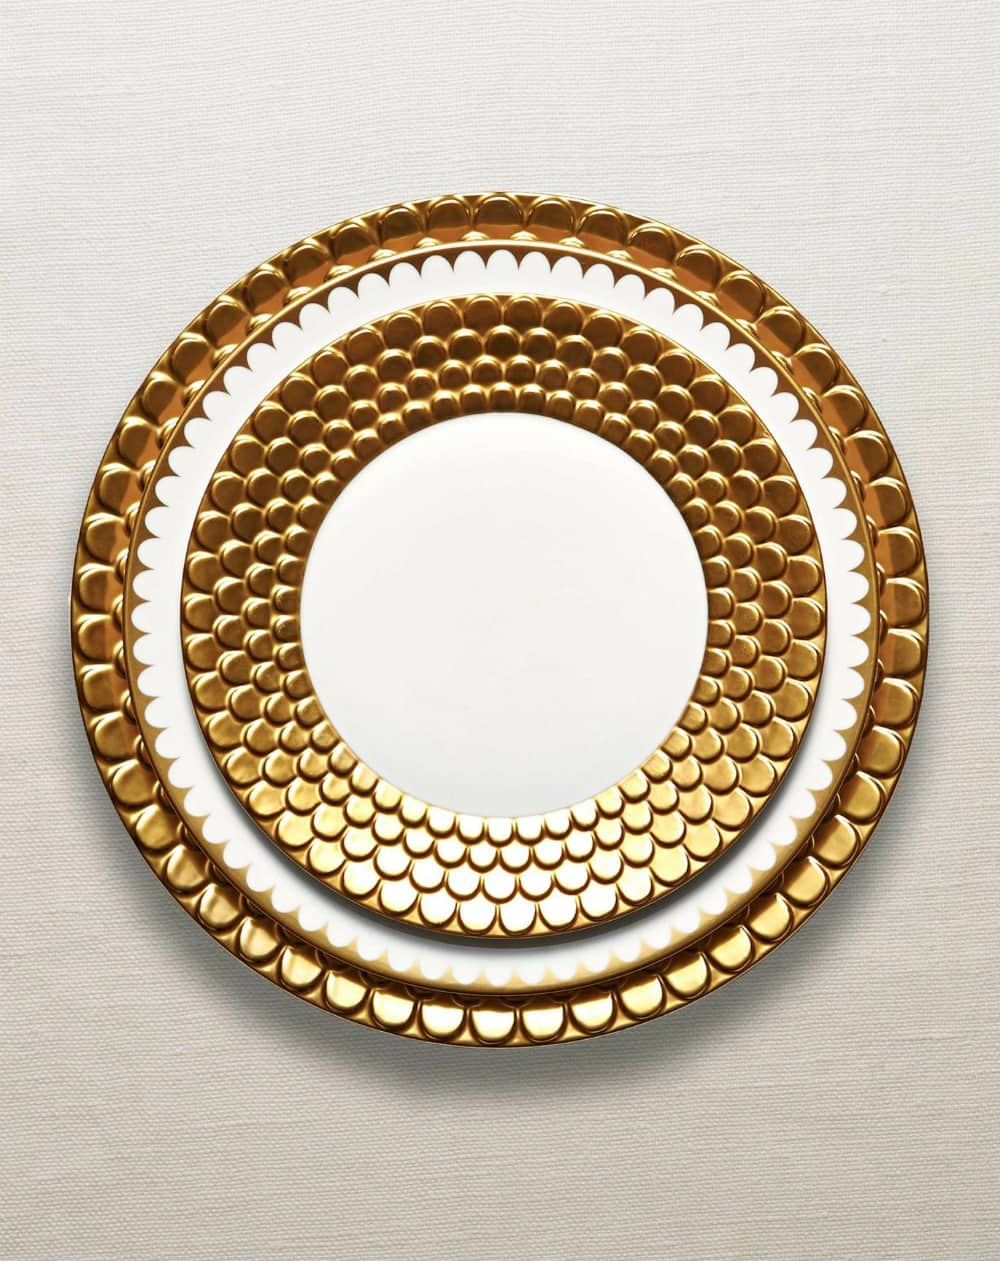 Aegean gold dinnerware collection